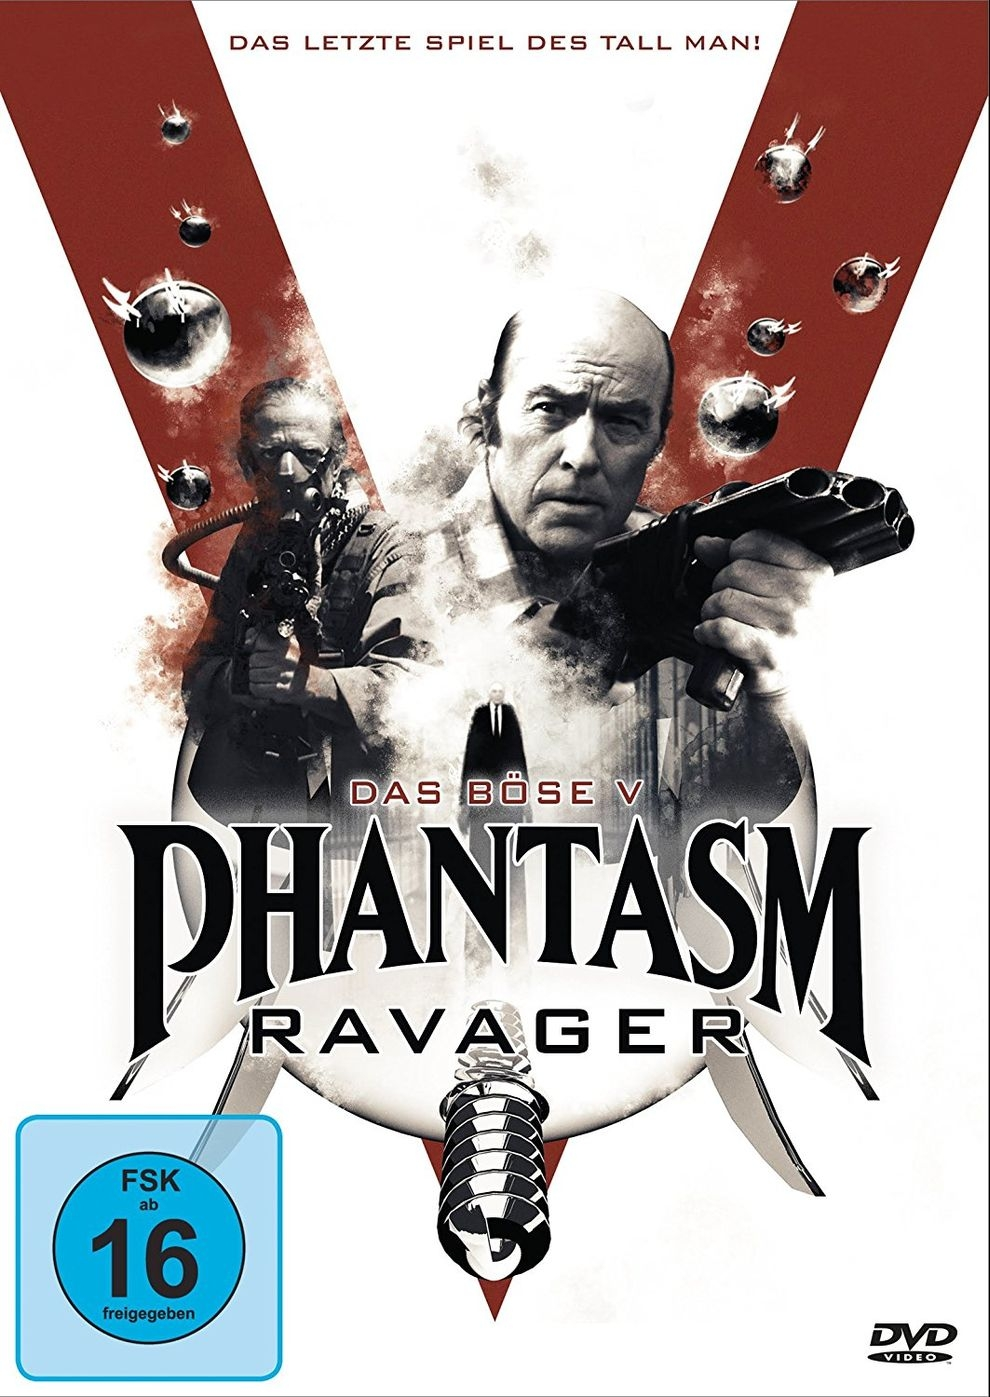 Phantasm Ravager - Das Böse V (Poster)